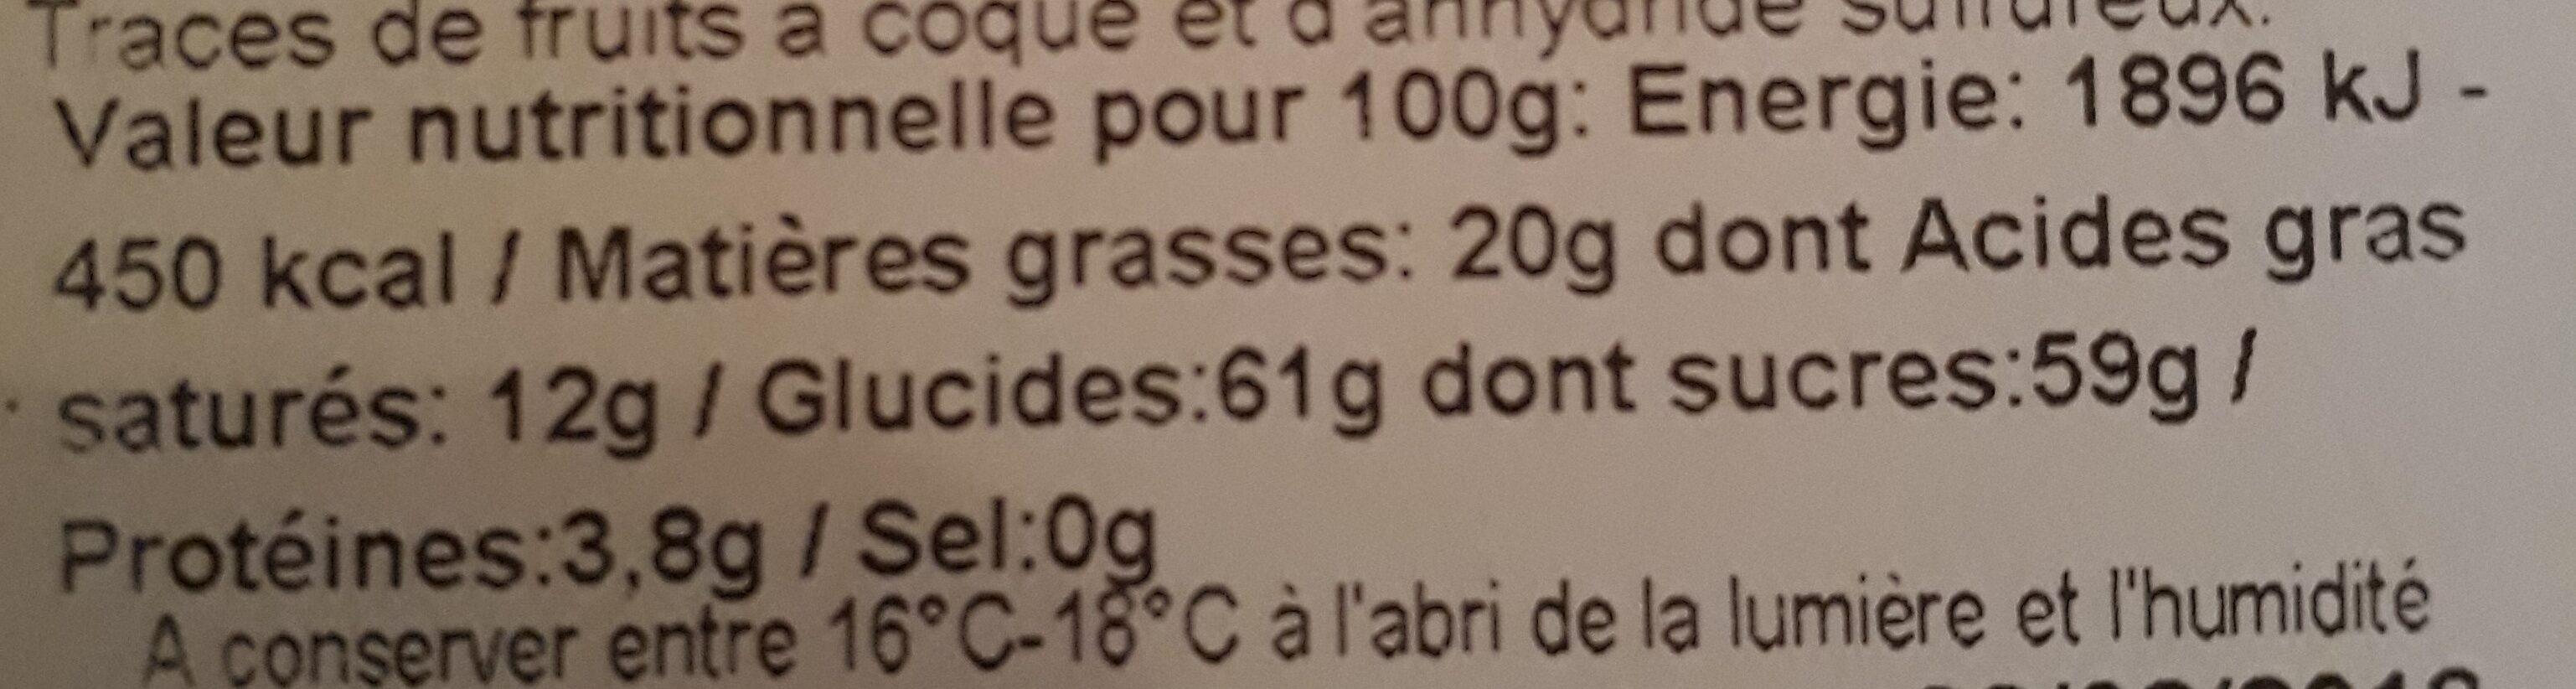 Orangettes - Valori nutrizionali - fr